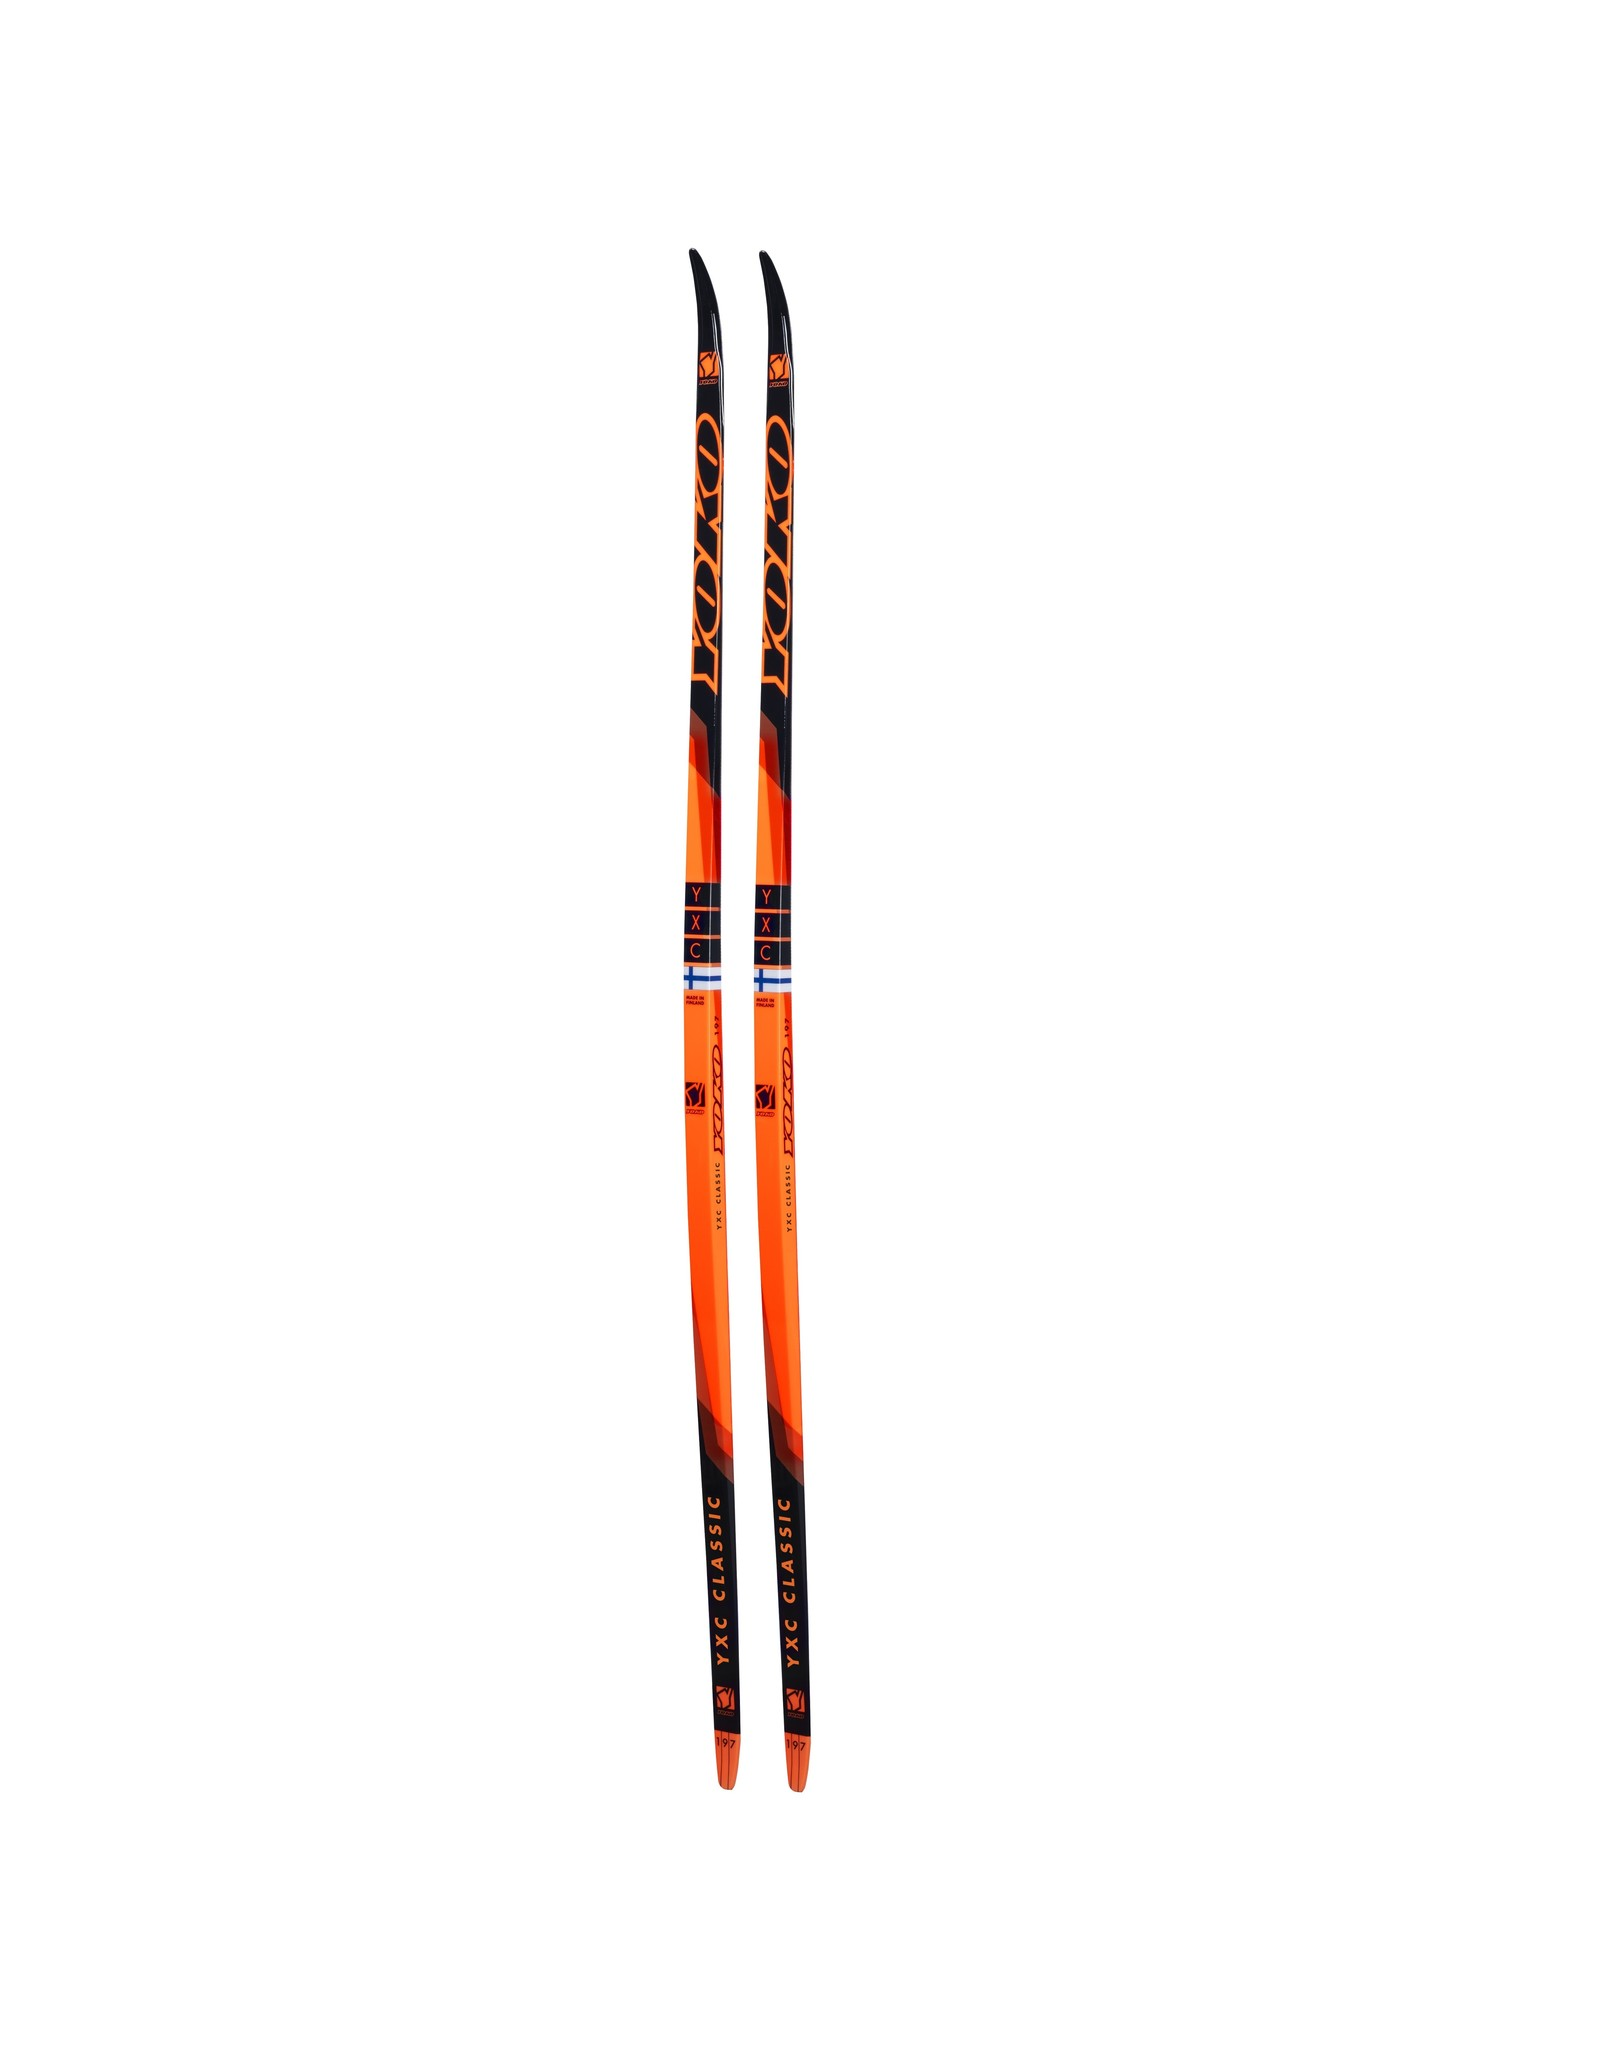 Yoko Yoko YXC Classic Ski